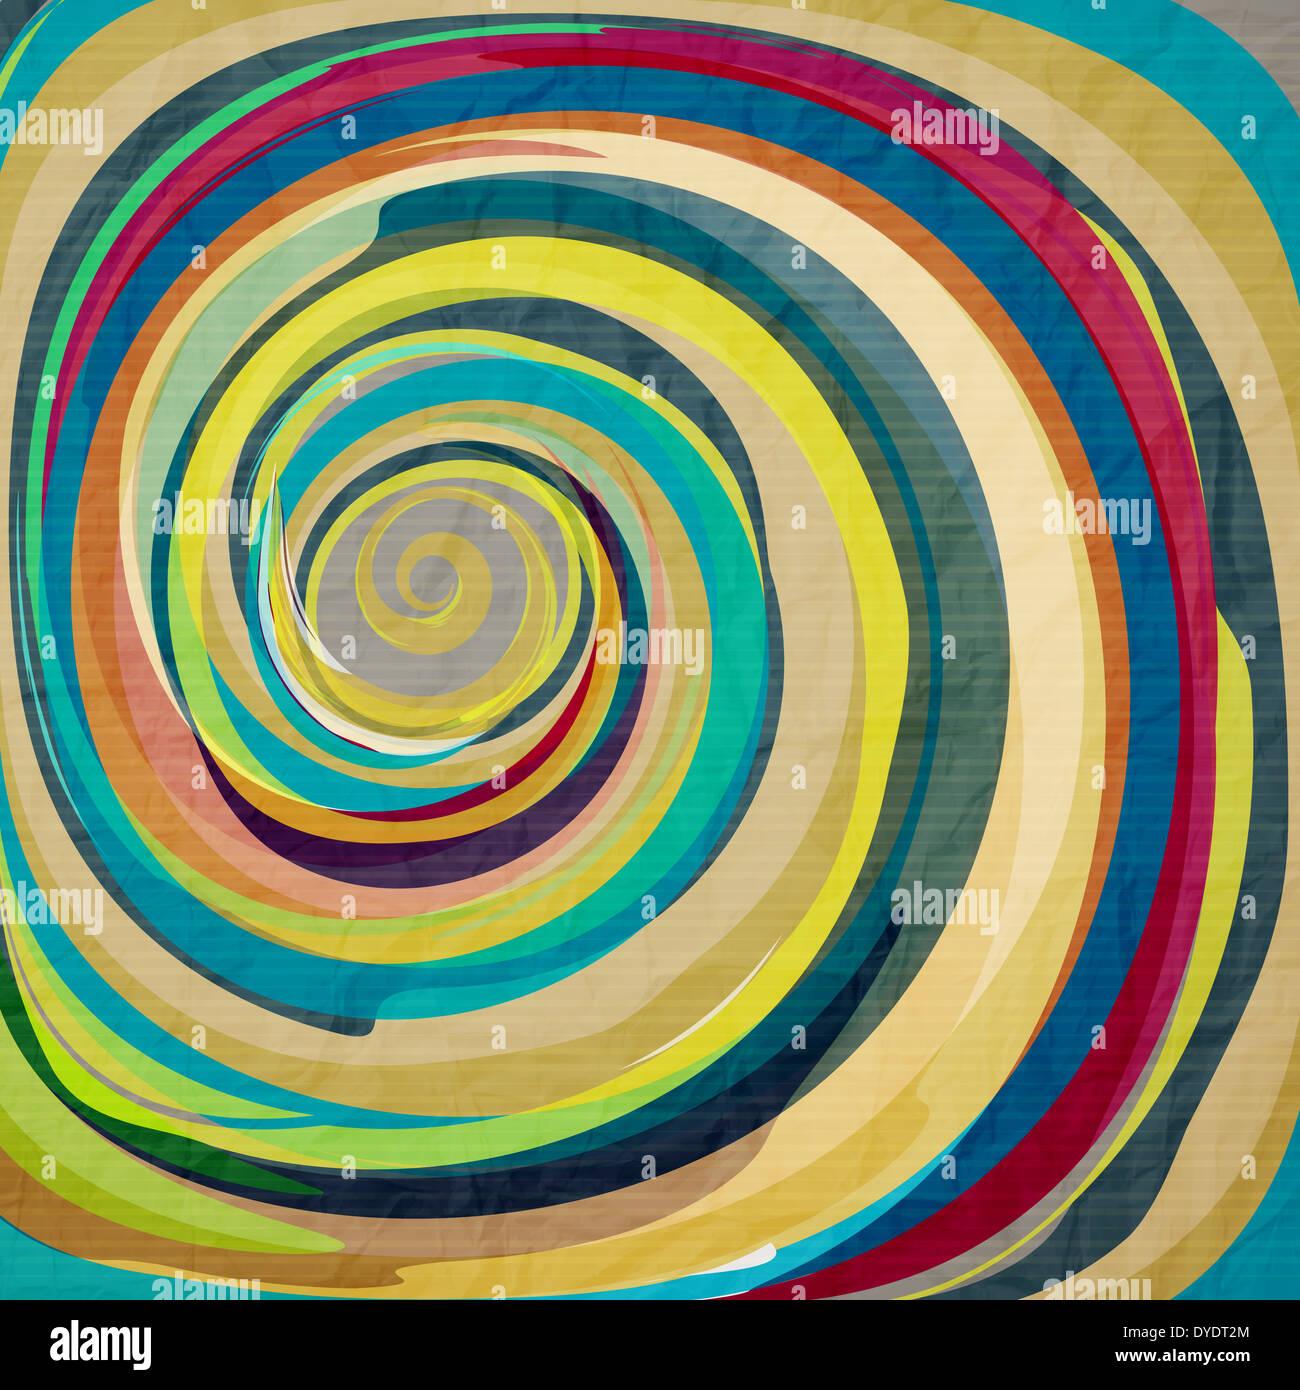 Con un colorido tapiz abstracto remolino en papel con textura Imagen De Stock